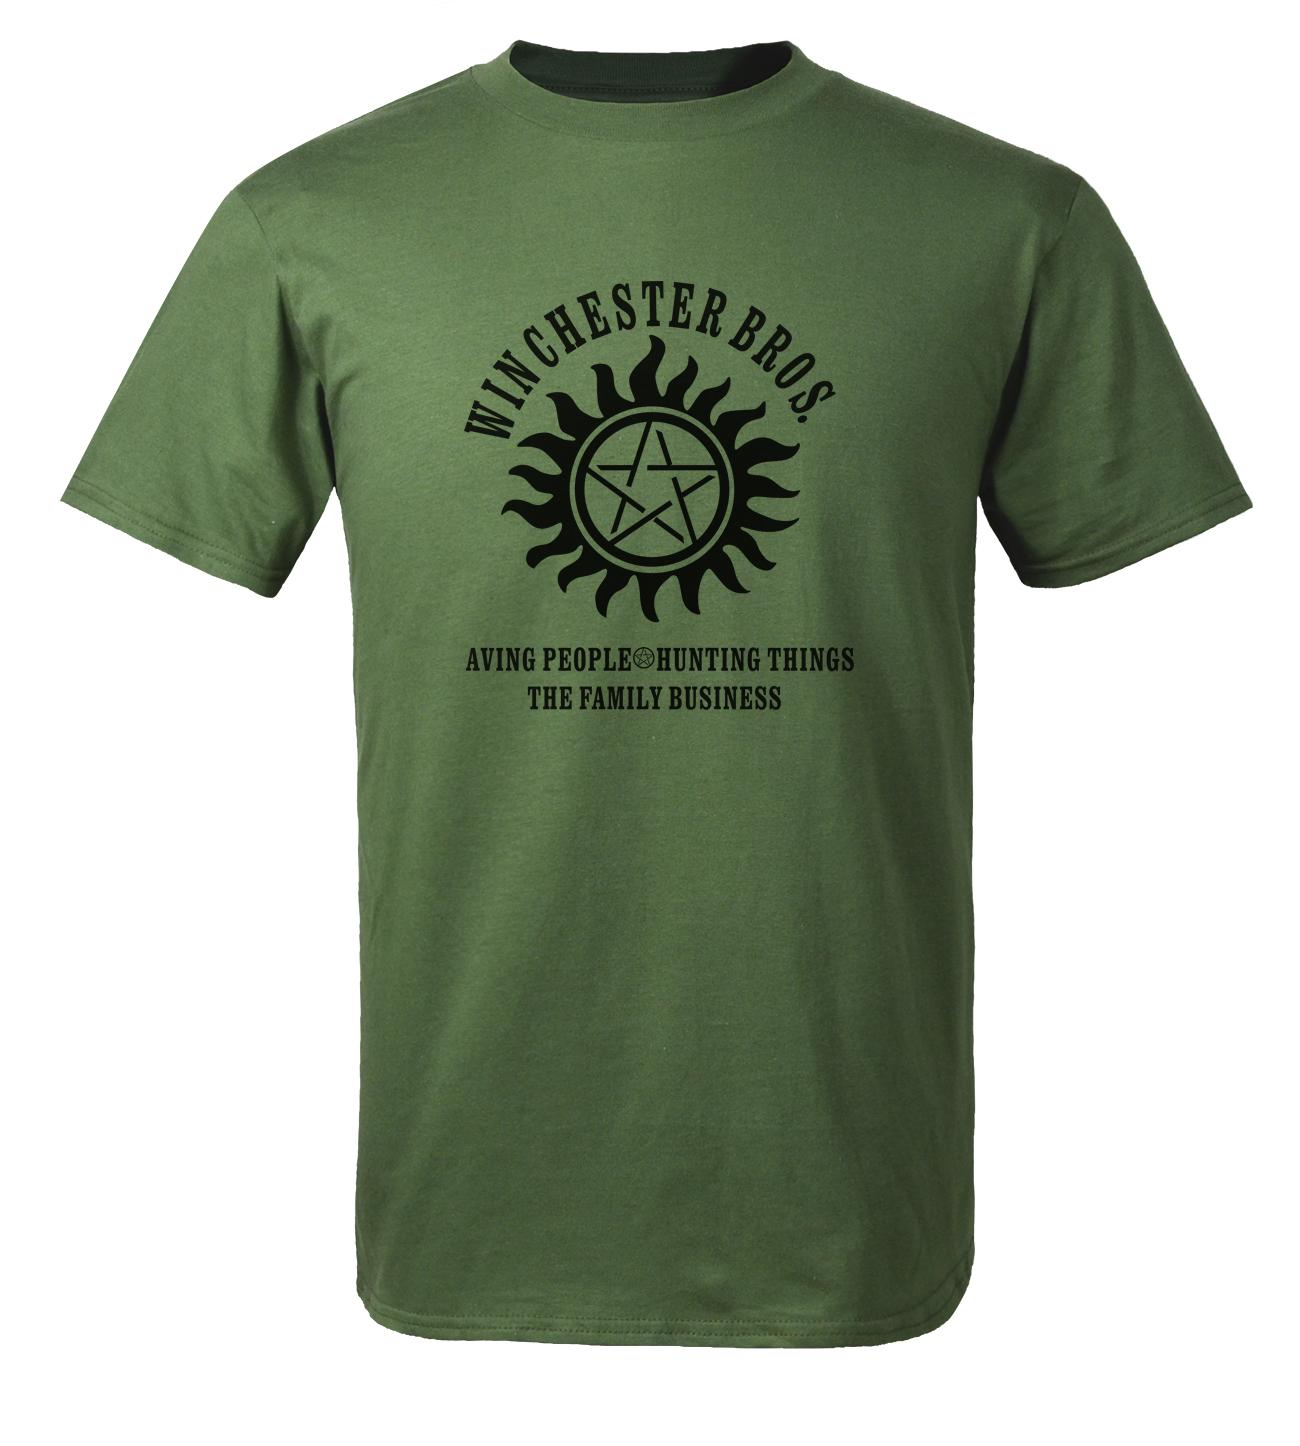 Fashion T Shirt Winchester Gaib Bros Menyelamatkan Orang Yang 2018 Baru Musim Panas Pria 100% Baju Lengan Pendek Katun Kaos Hipster Pria-Intl